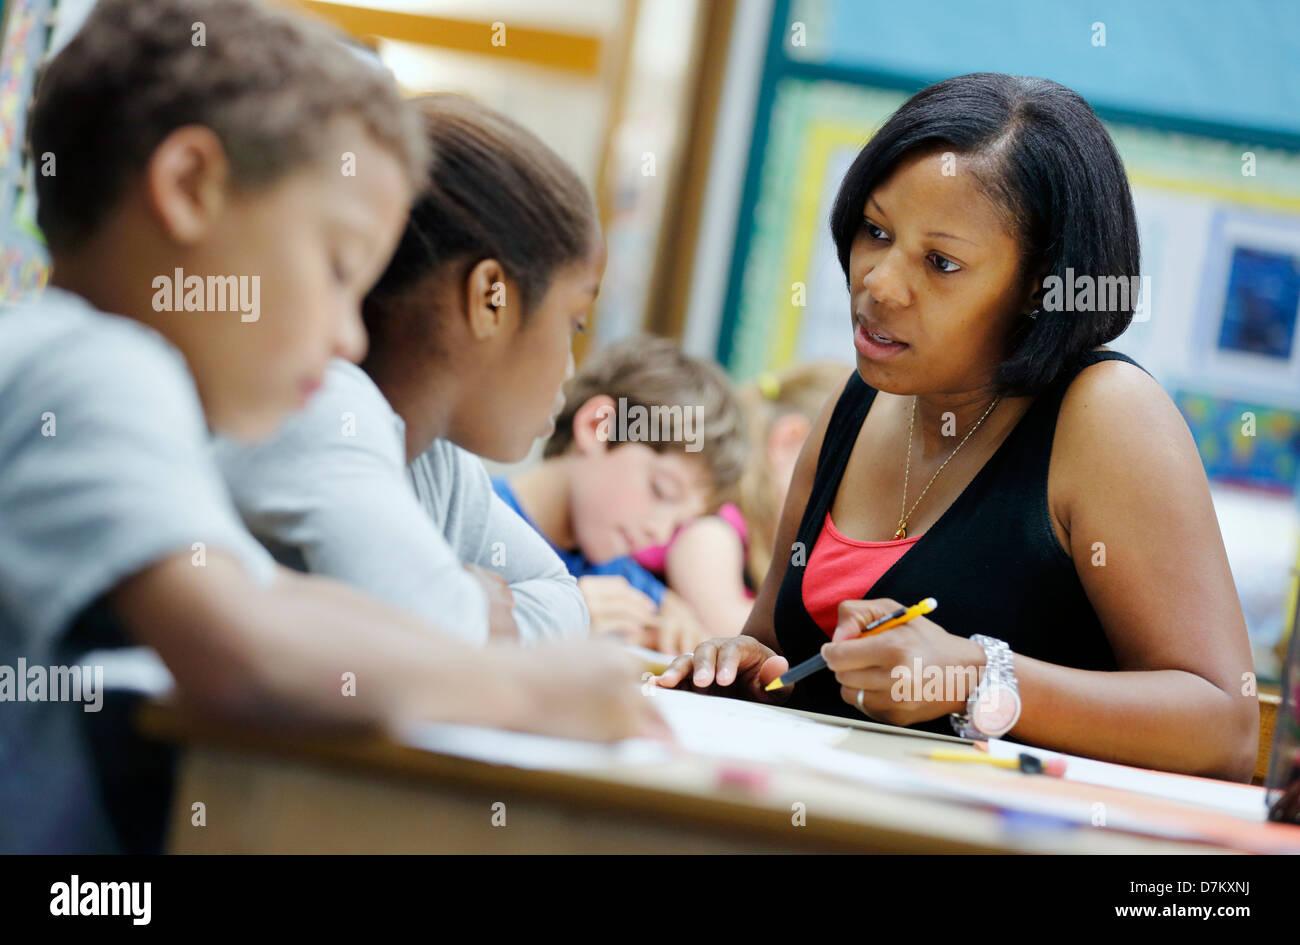 Elementary school teacher with students - Stock Image